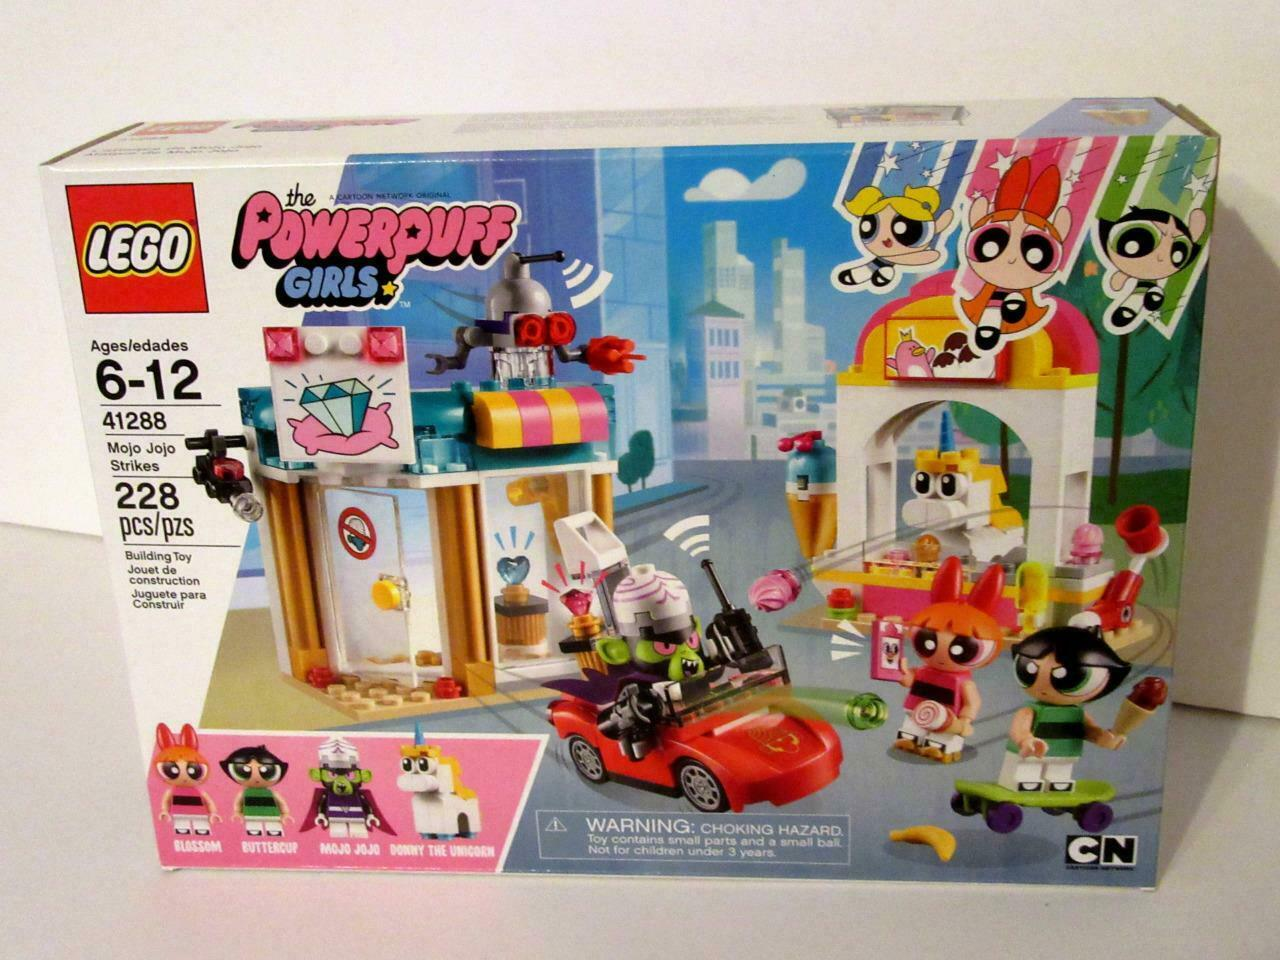 LEGO The Powerpuff Girls - - - MOJO JOJO STRIKES Pc Building Kit NEW  61f858